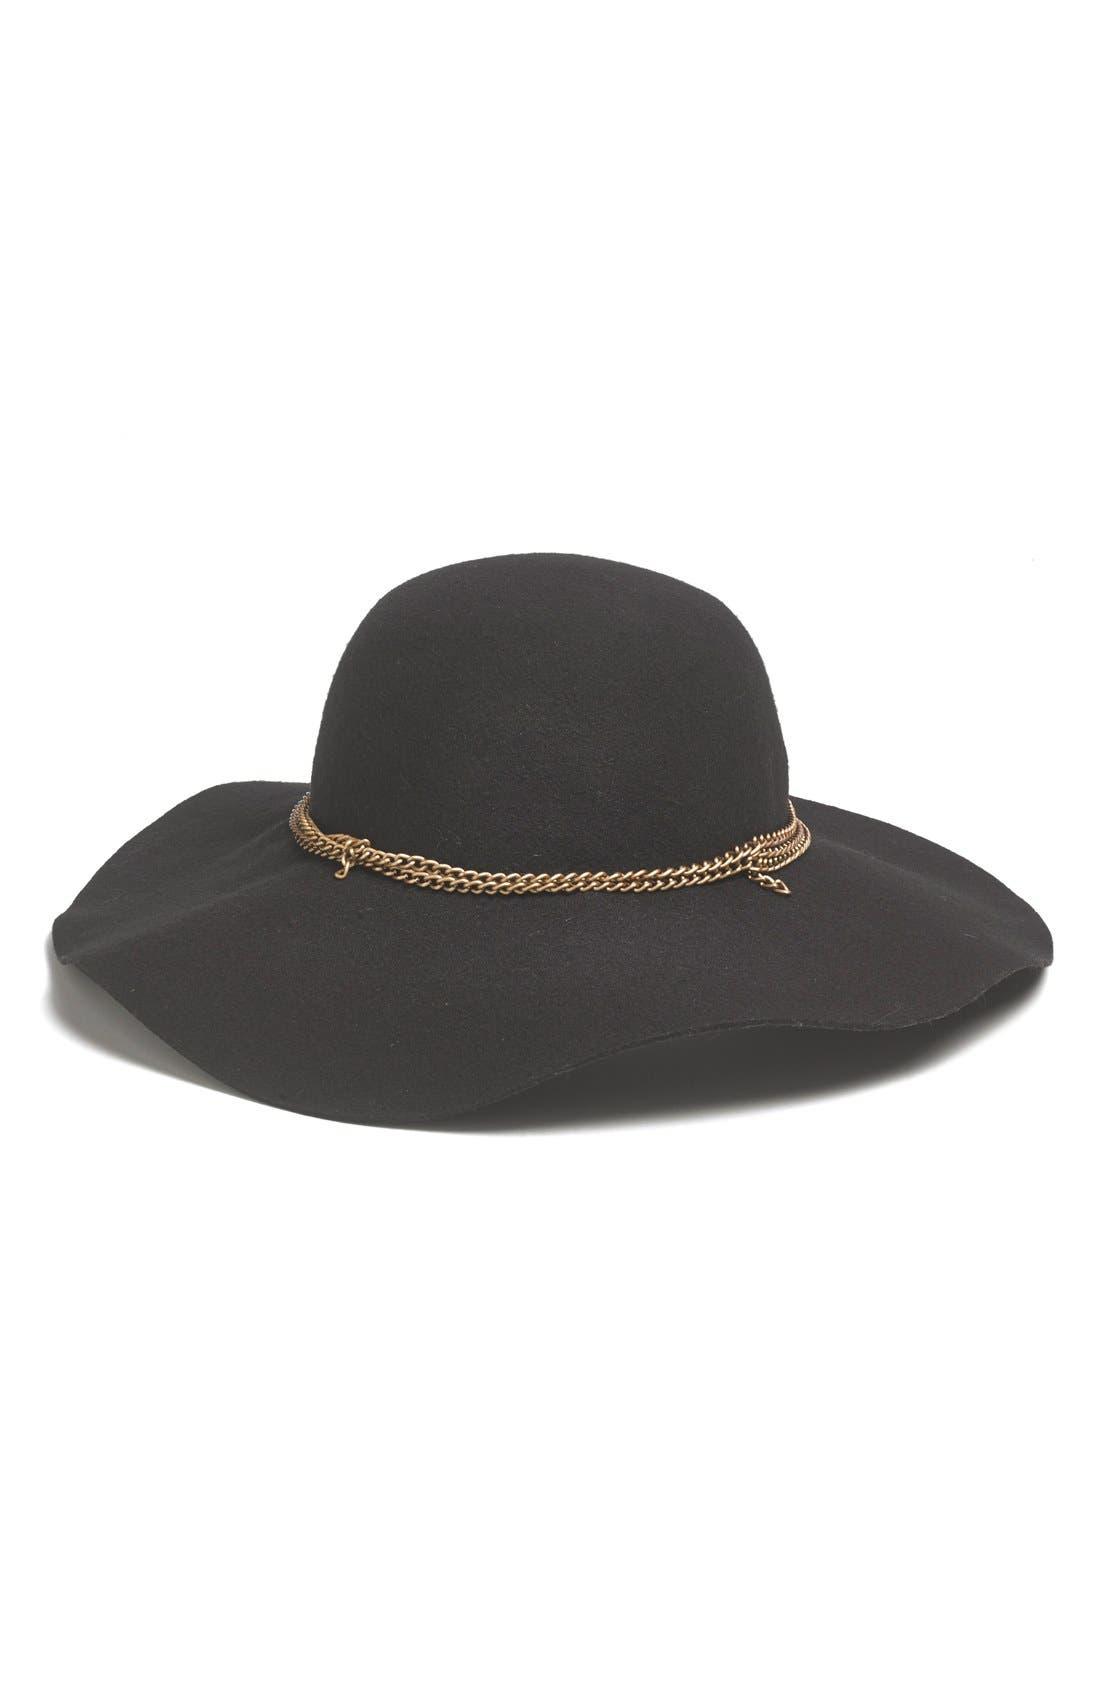 Main Image - Tildon Floppy Wool Hat